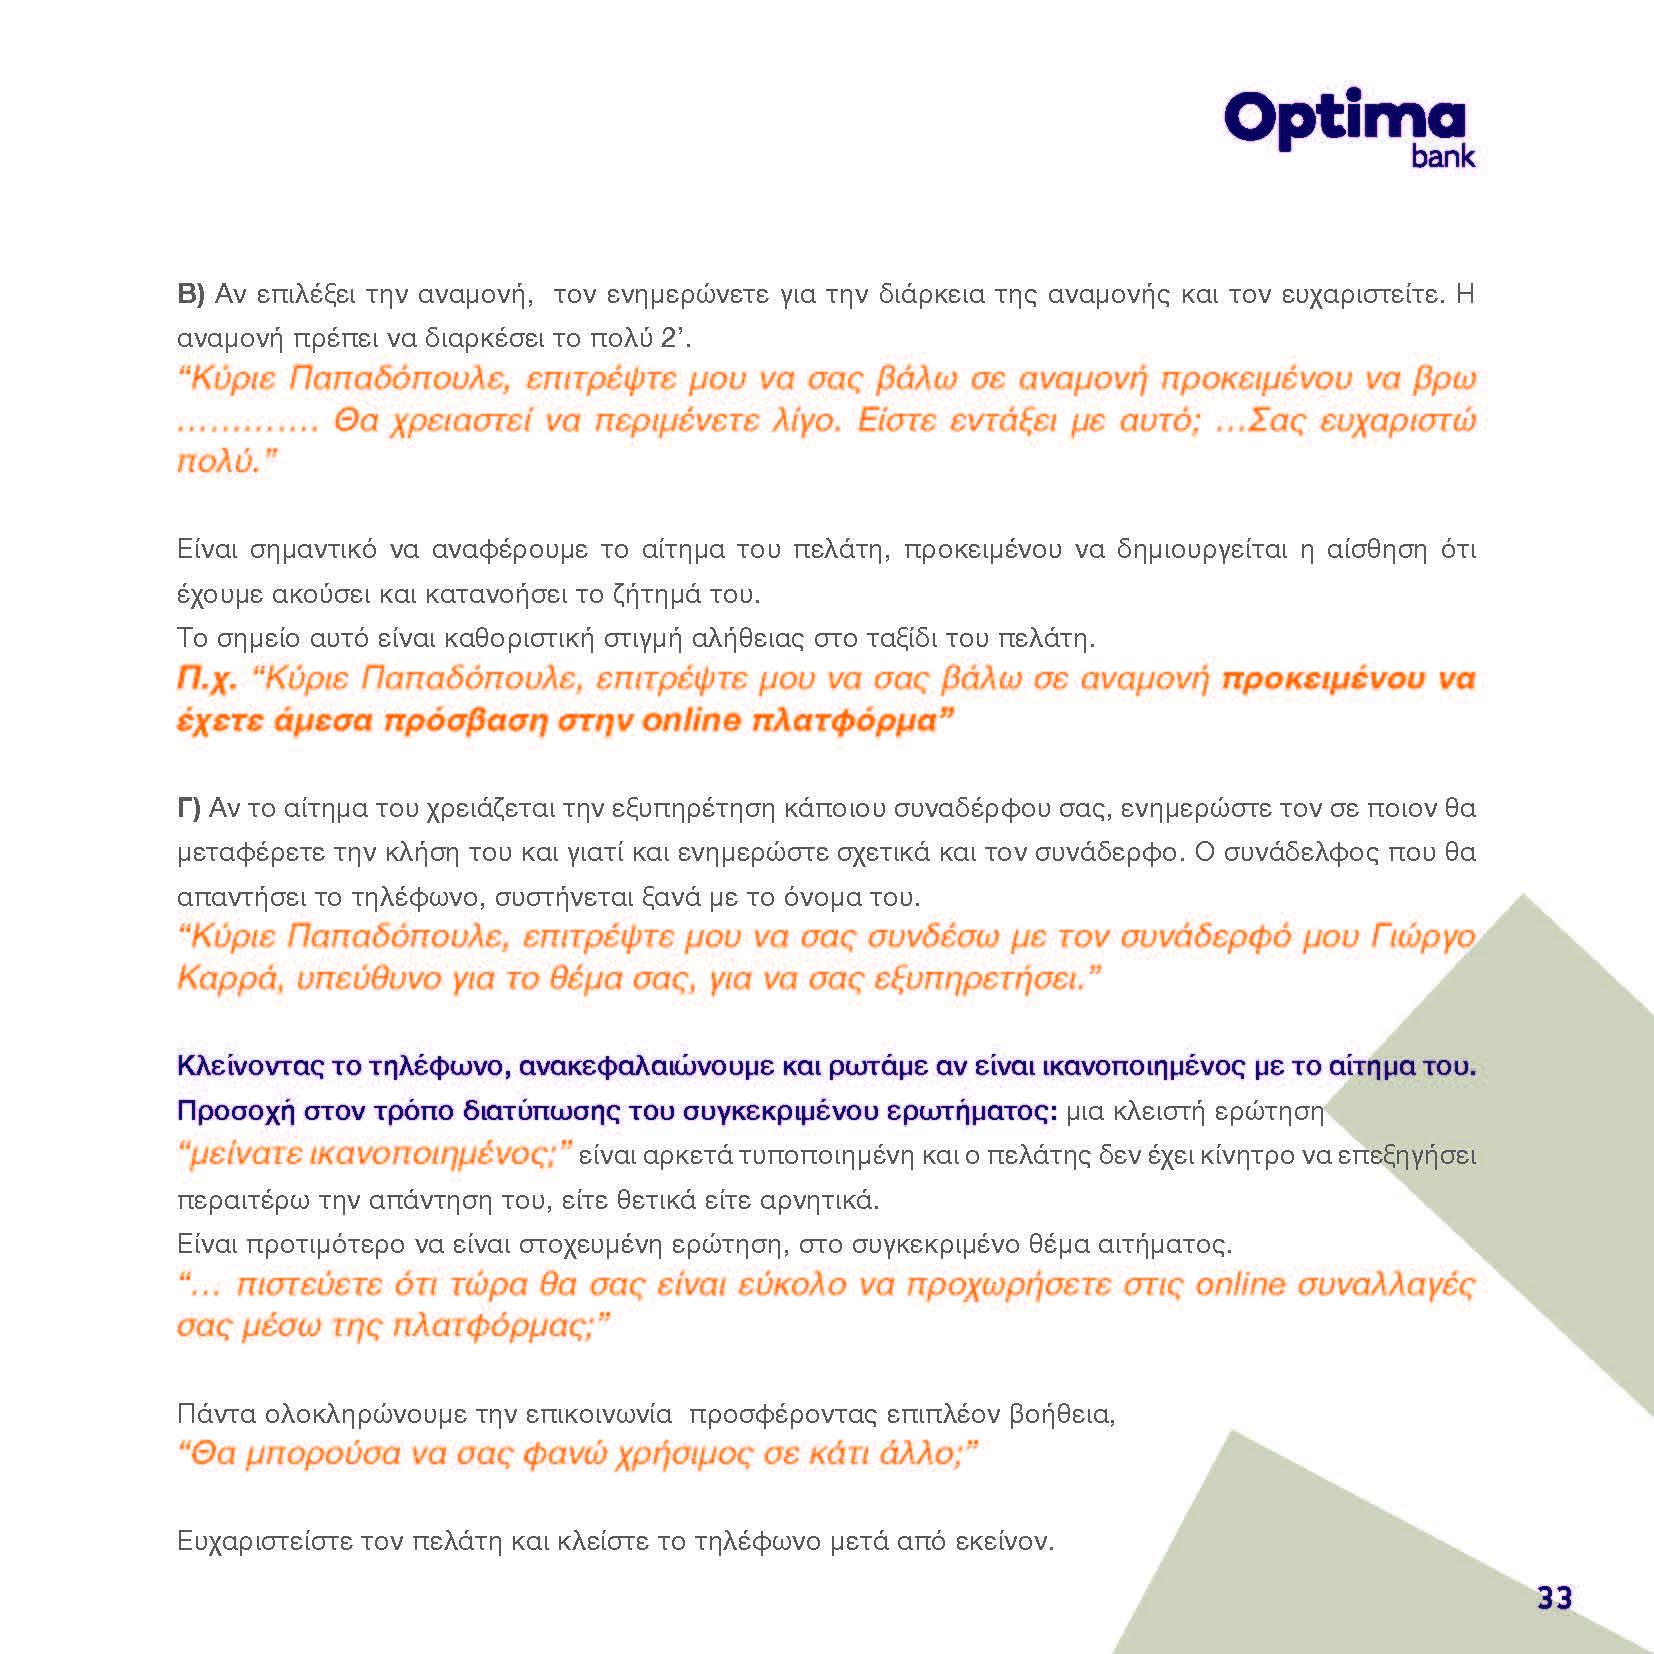 https://www.jib.gr/wp-content/uploads/2020/09/OPTIMA-BANK-BOOKLET-WEB_Page_033.jpg